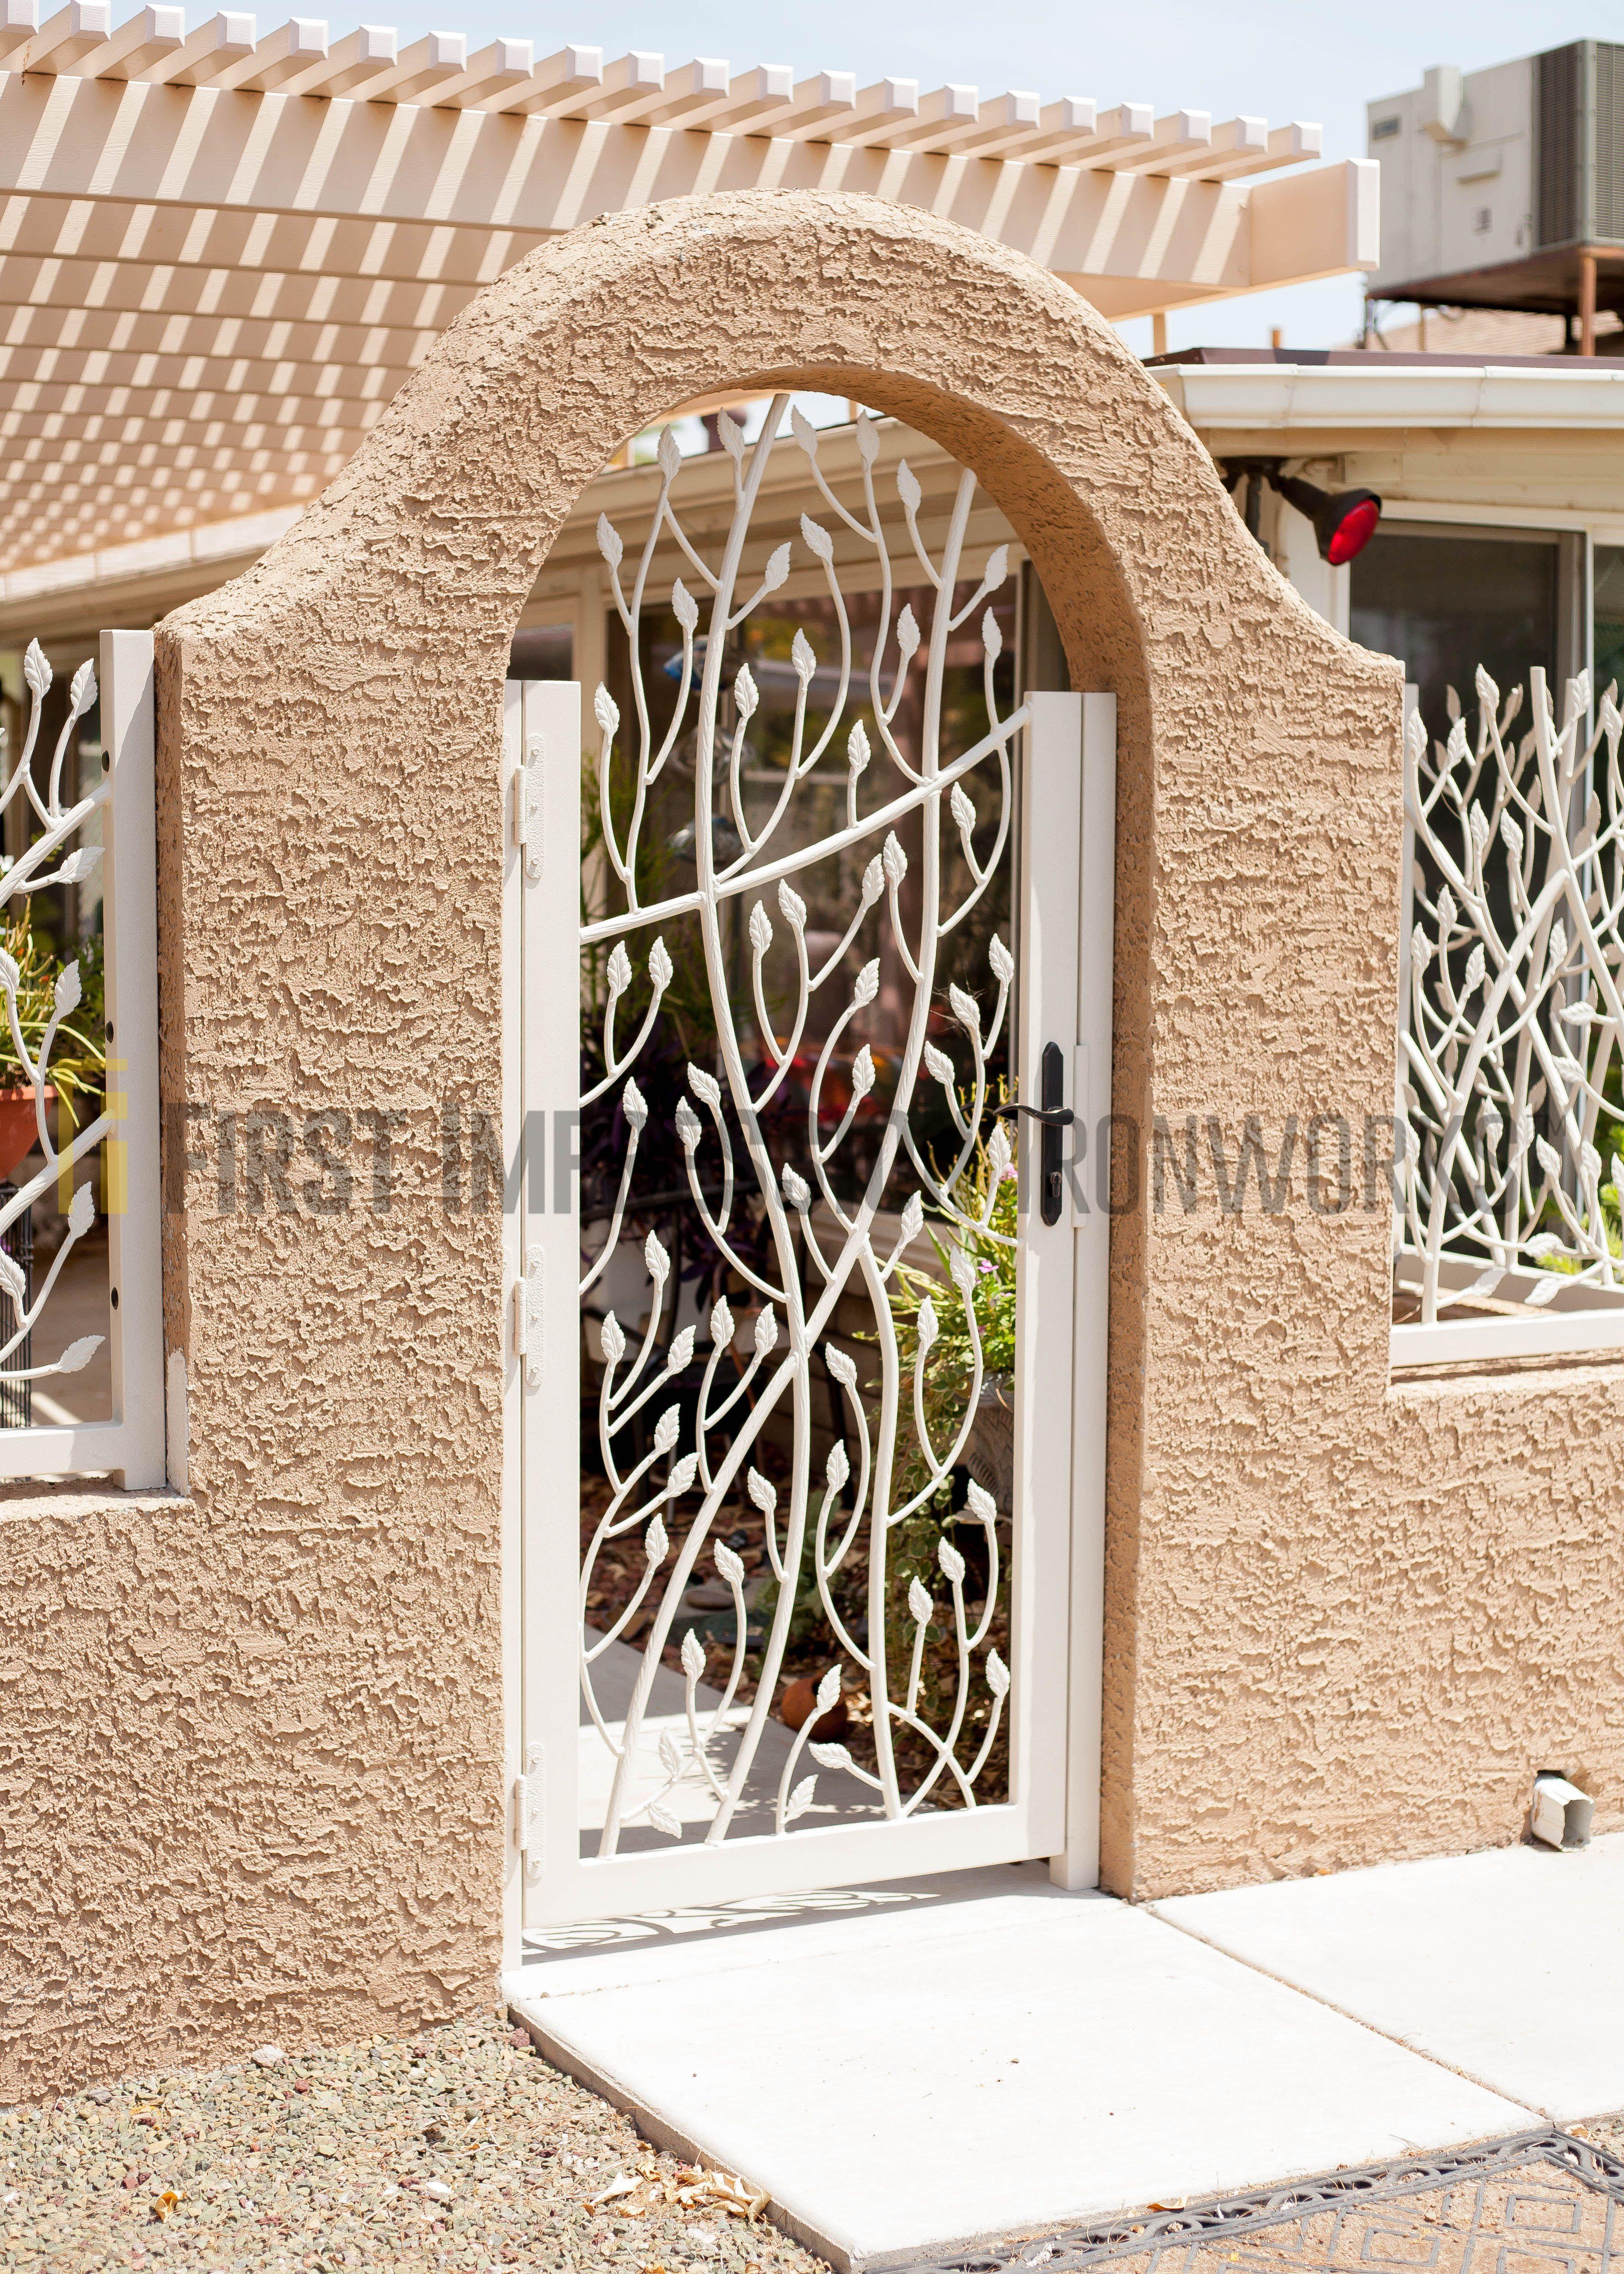 First Impression Ironworks Exterior Iron Gate #ornamentaliron #irongate #customiron #ironartwork & First Impression Ironworks Exterior Iron Gate #ornamentaliron ...